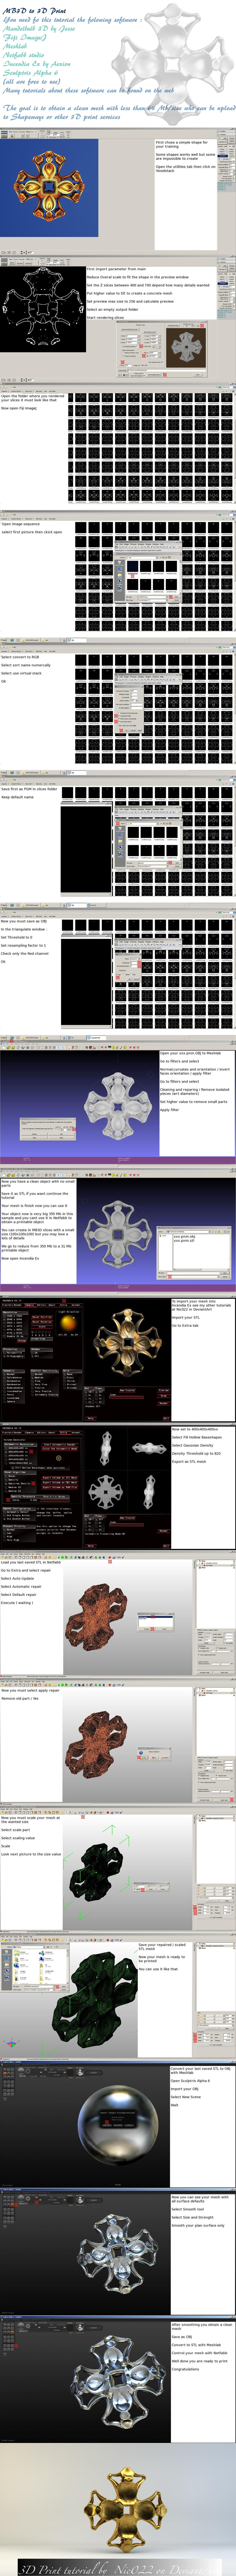 MB3D to 3D Print Tutorial by nic022